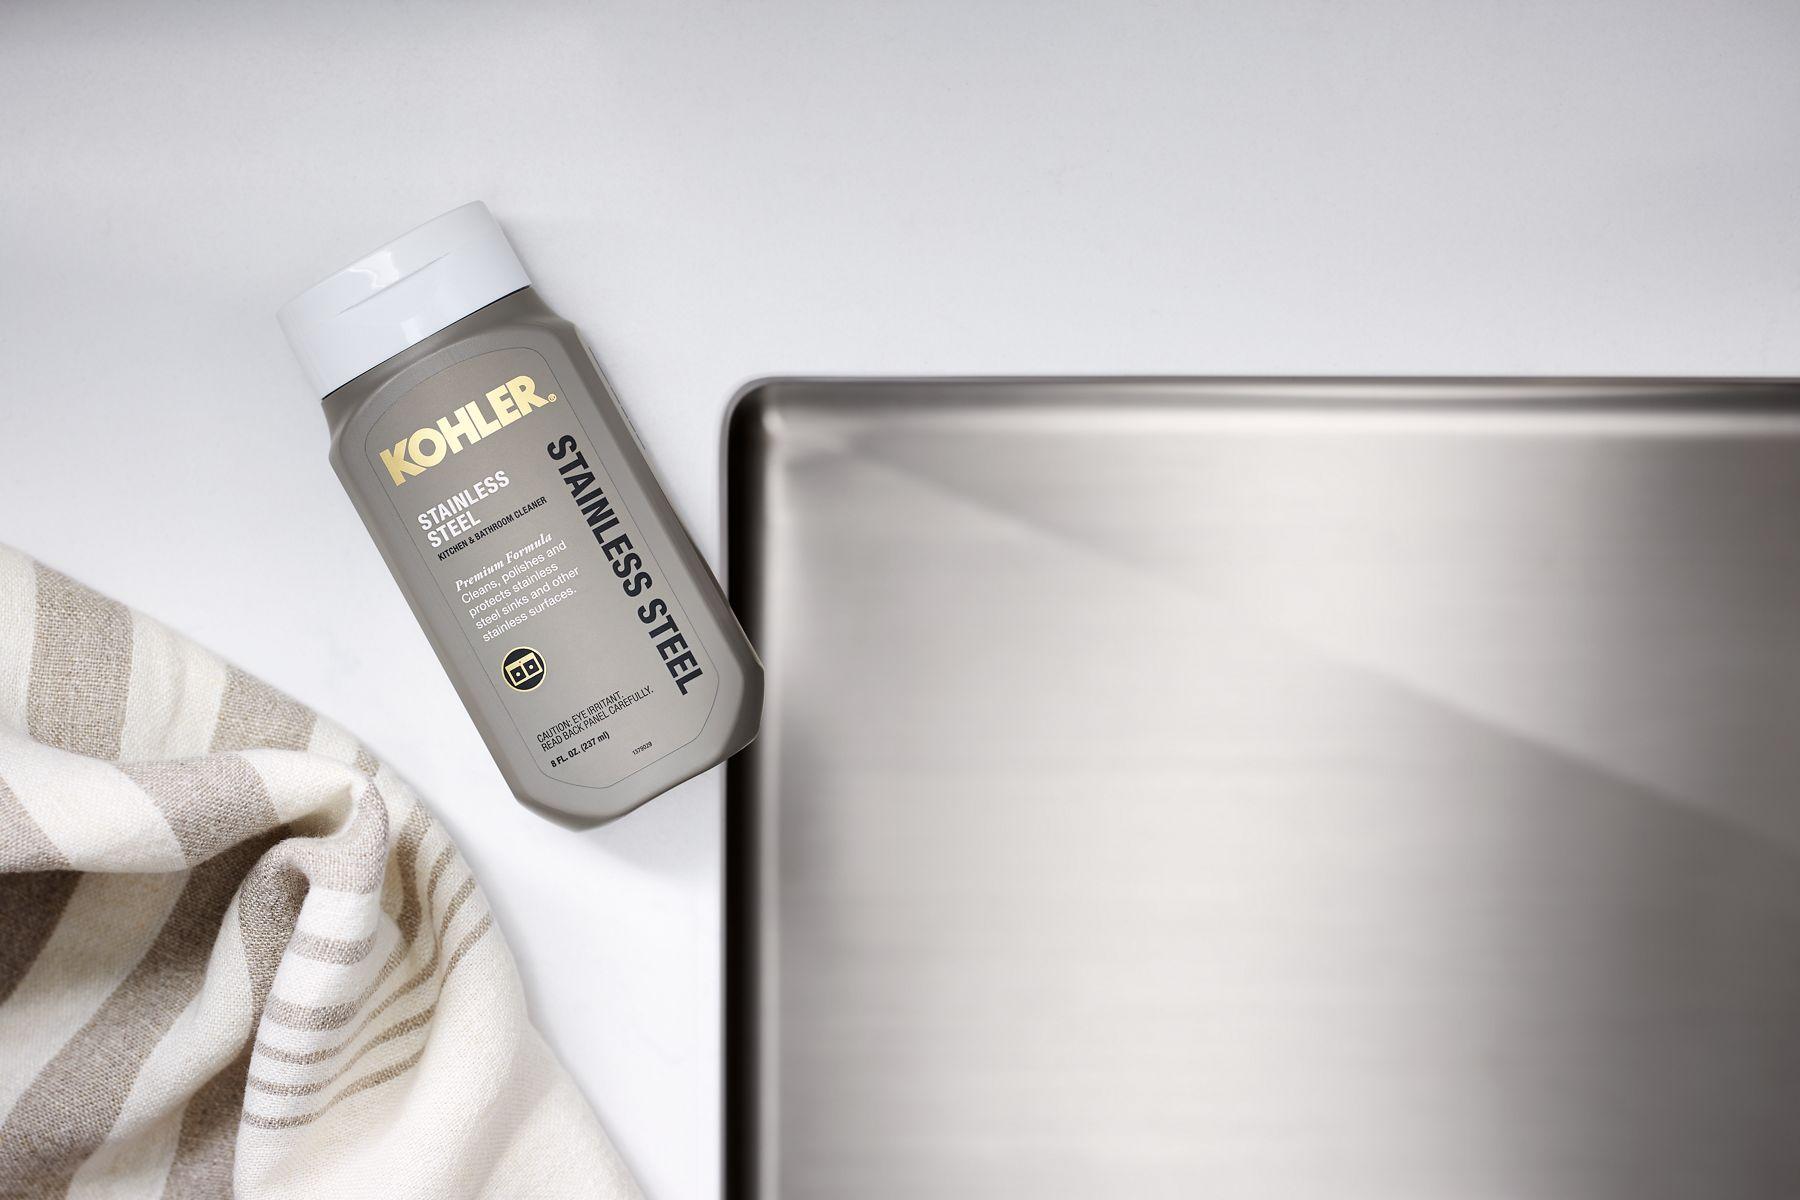 stainless steel kitchen sinks cleaner